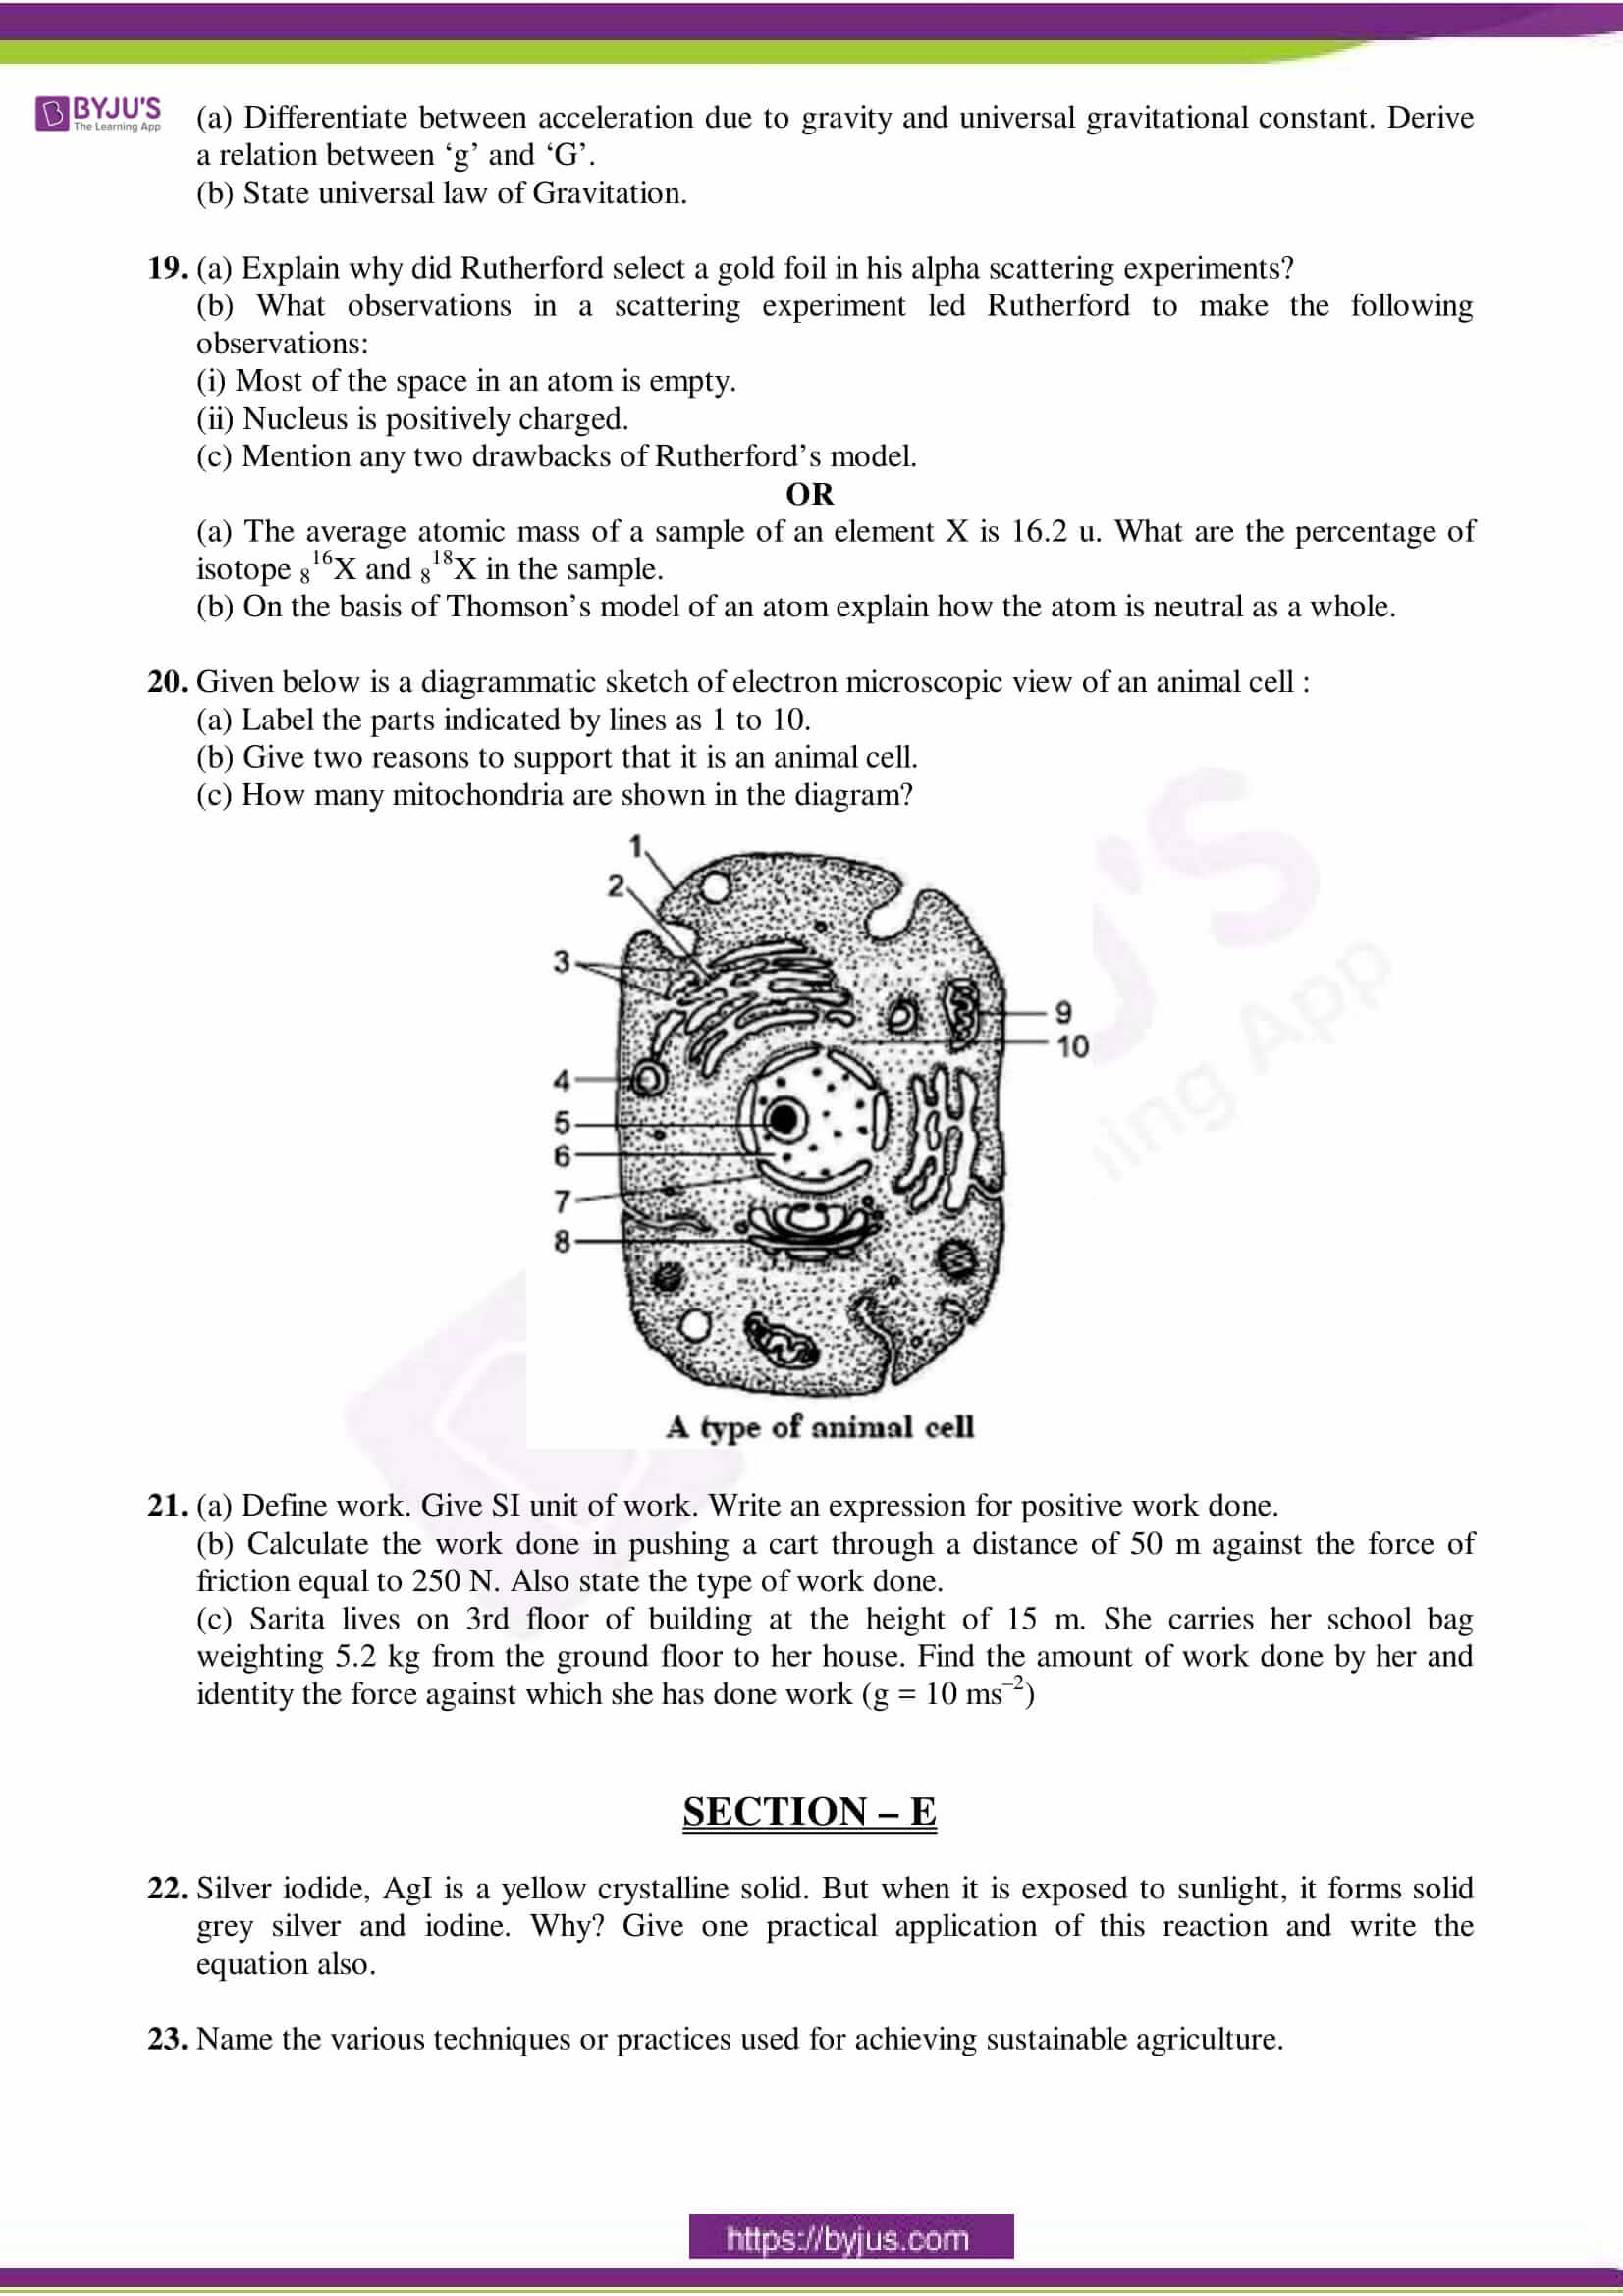 cbse sample paper class 9 science set 7